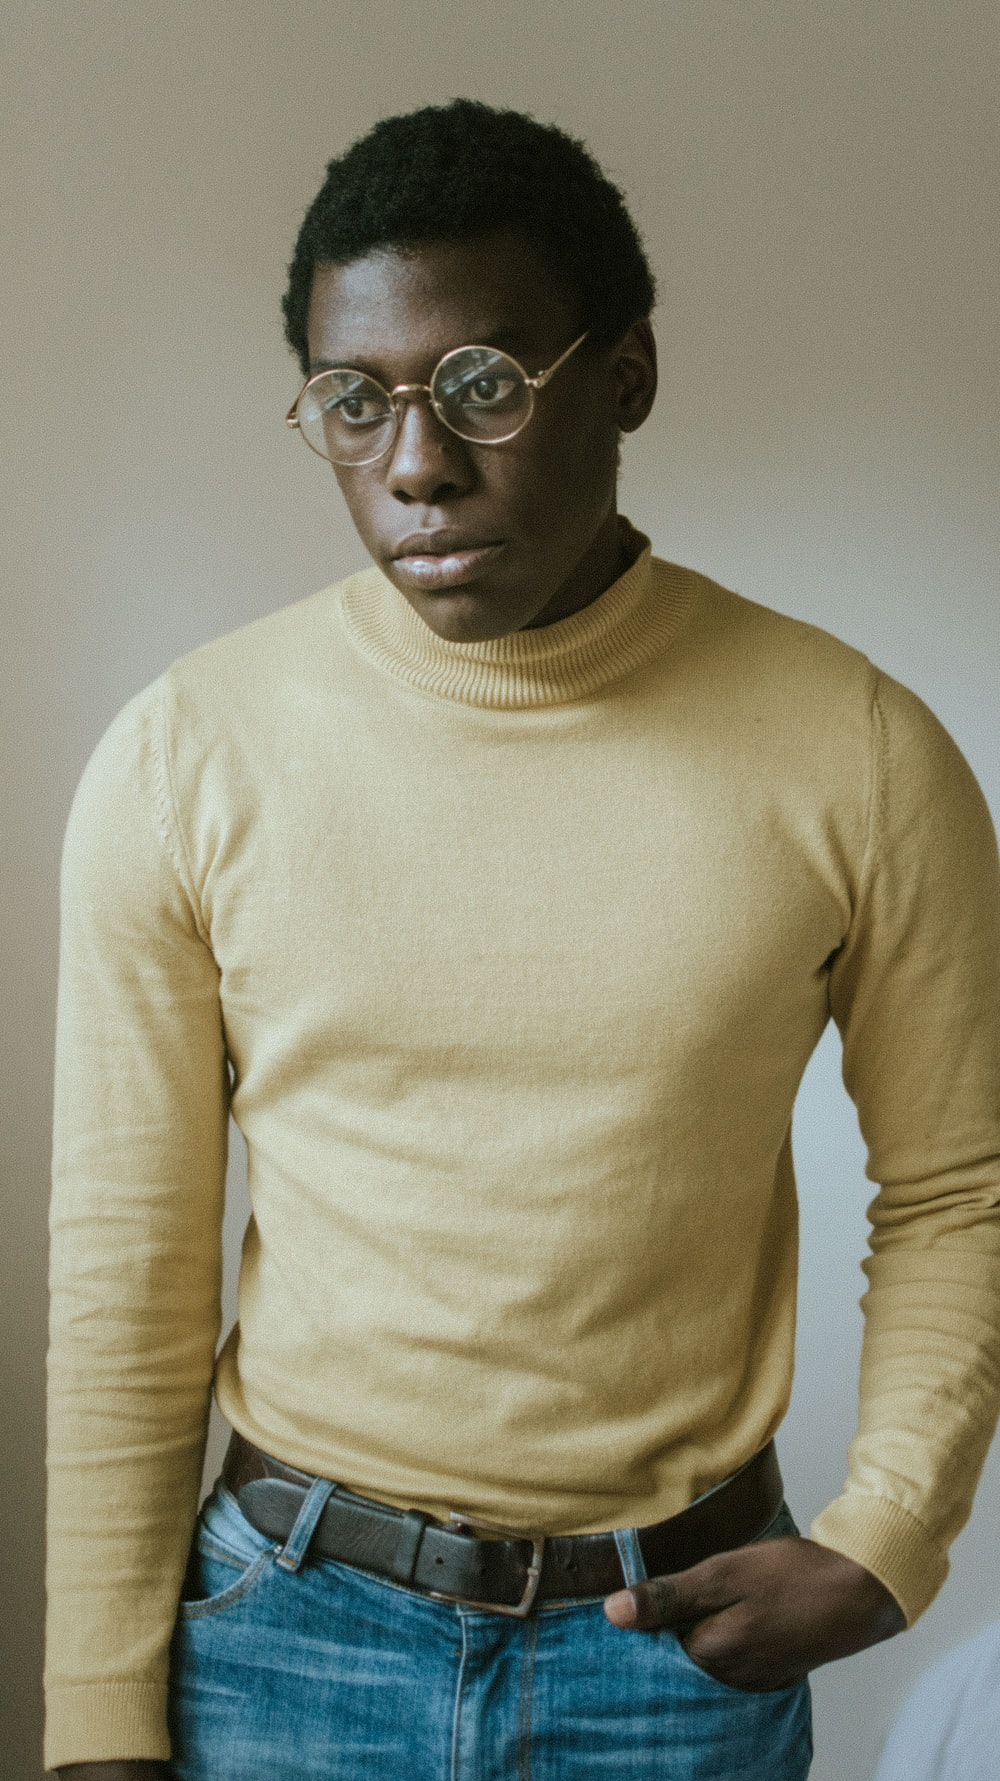 man wearing yellow sweater